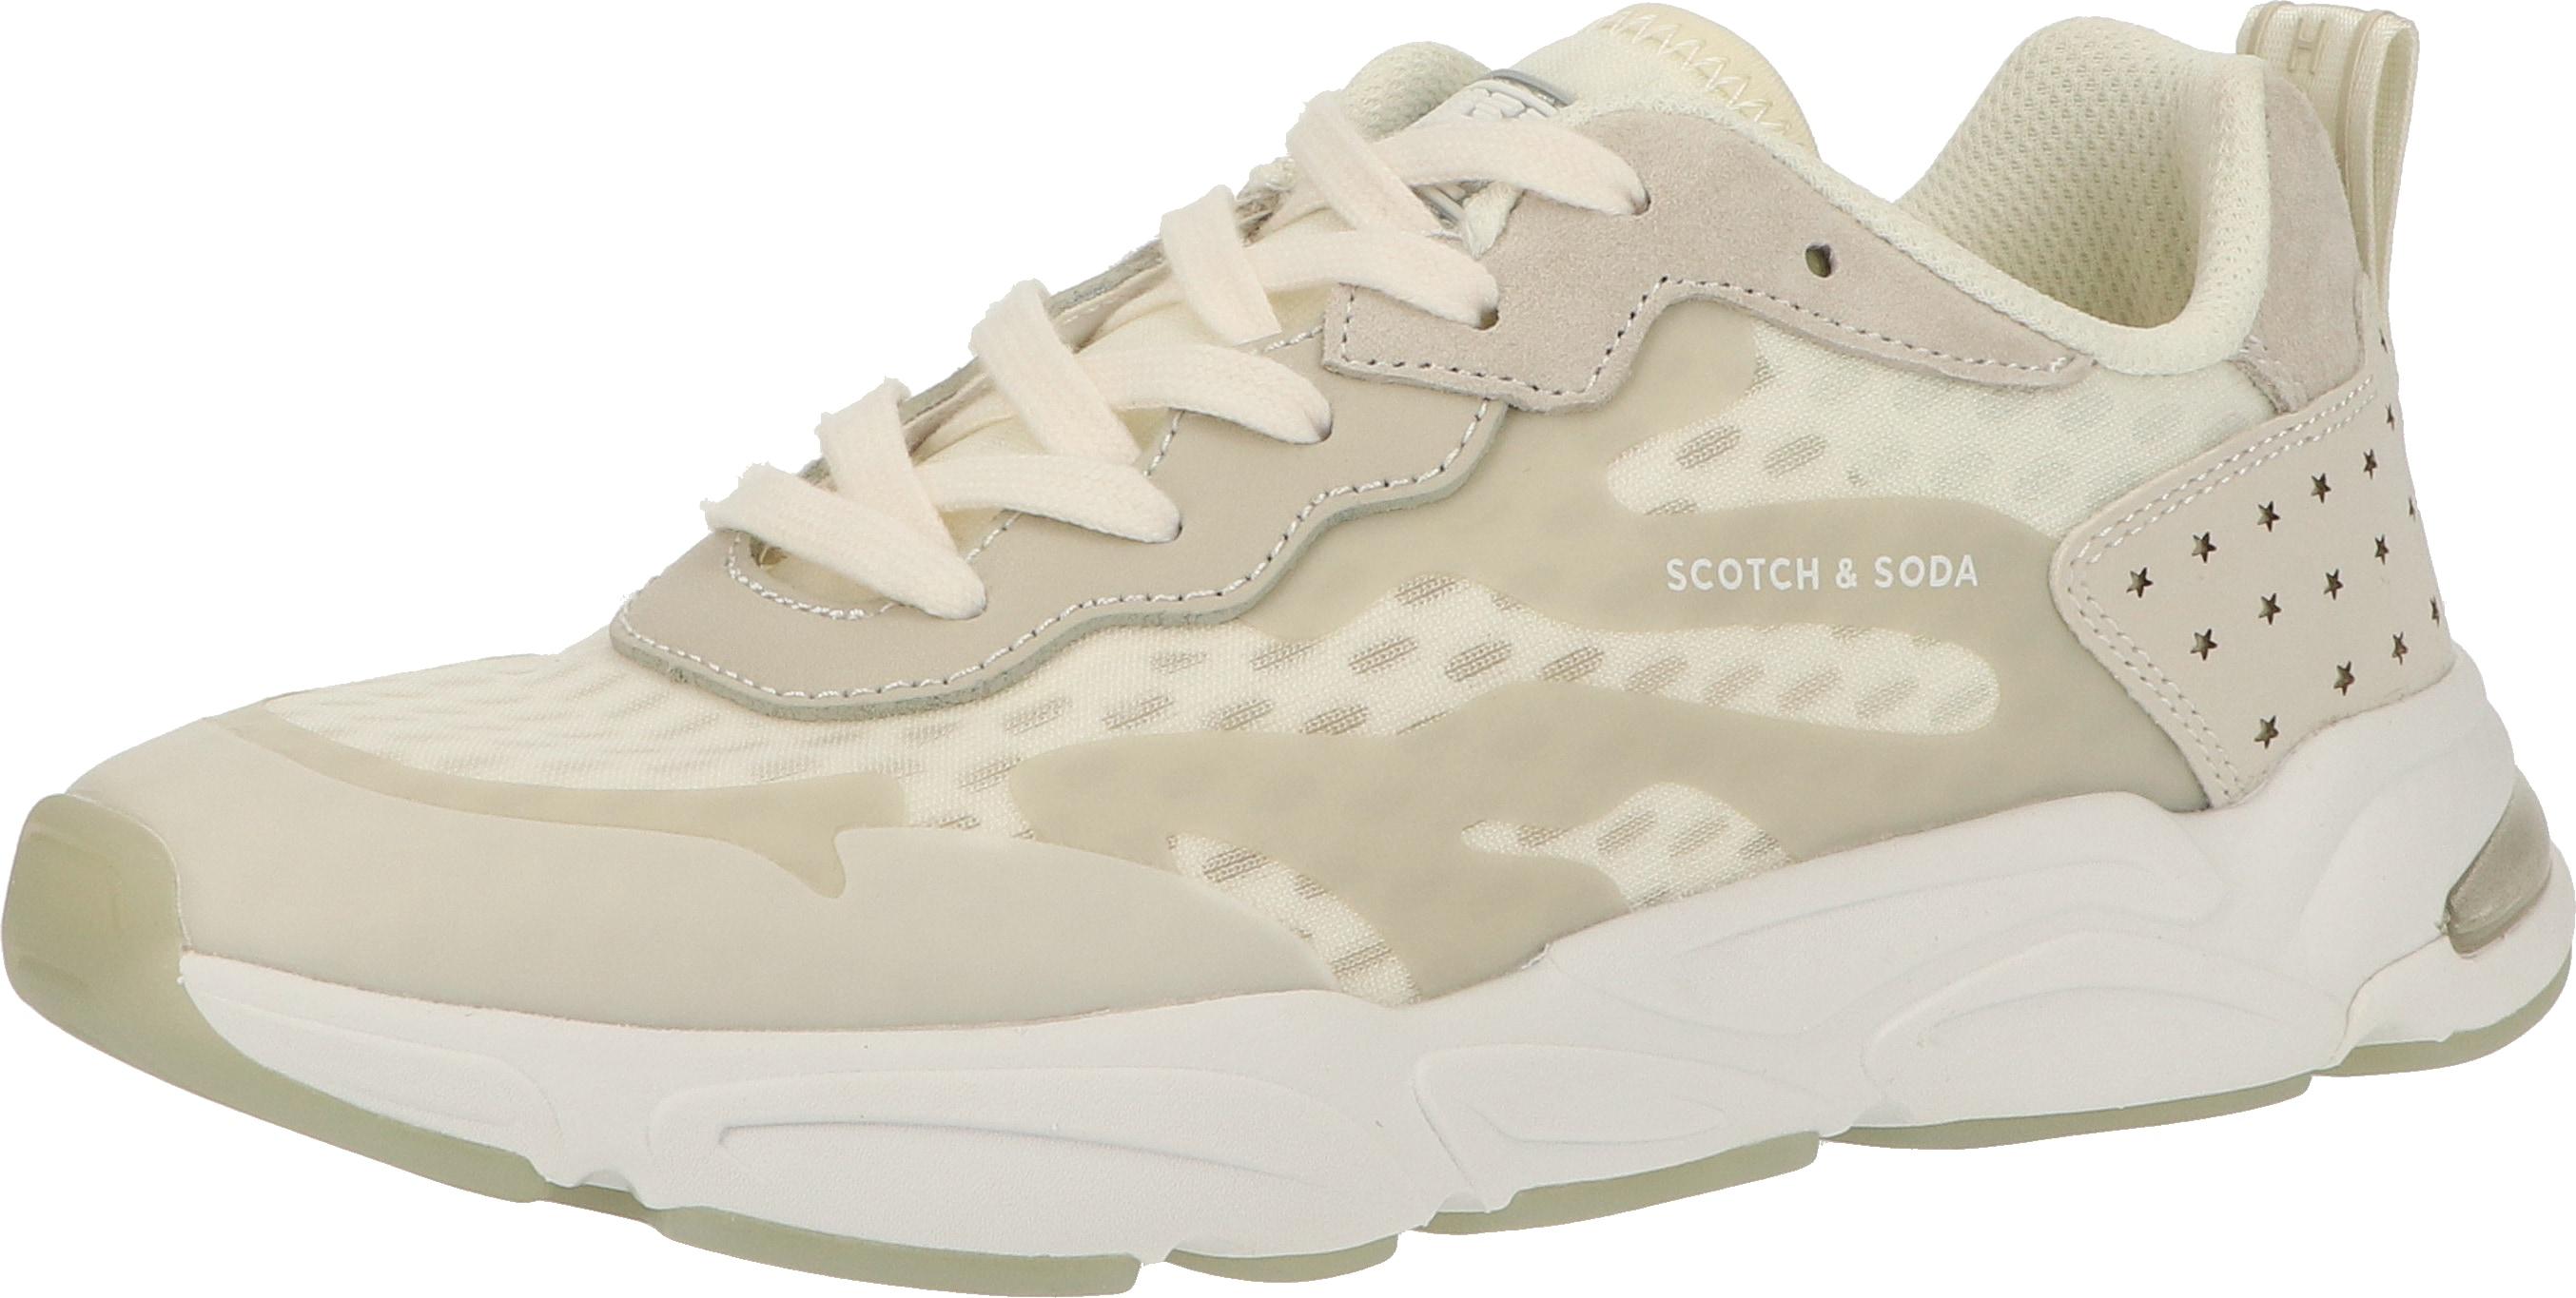 scotch & soda -  Sneaker Veolurs/Textil/Synthetik